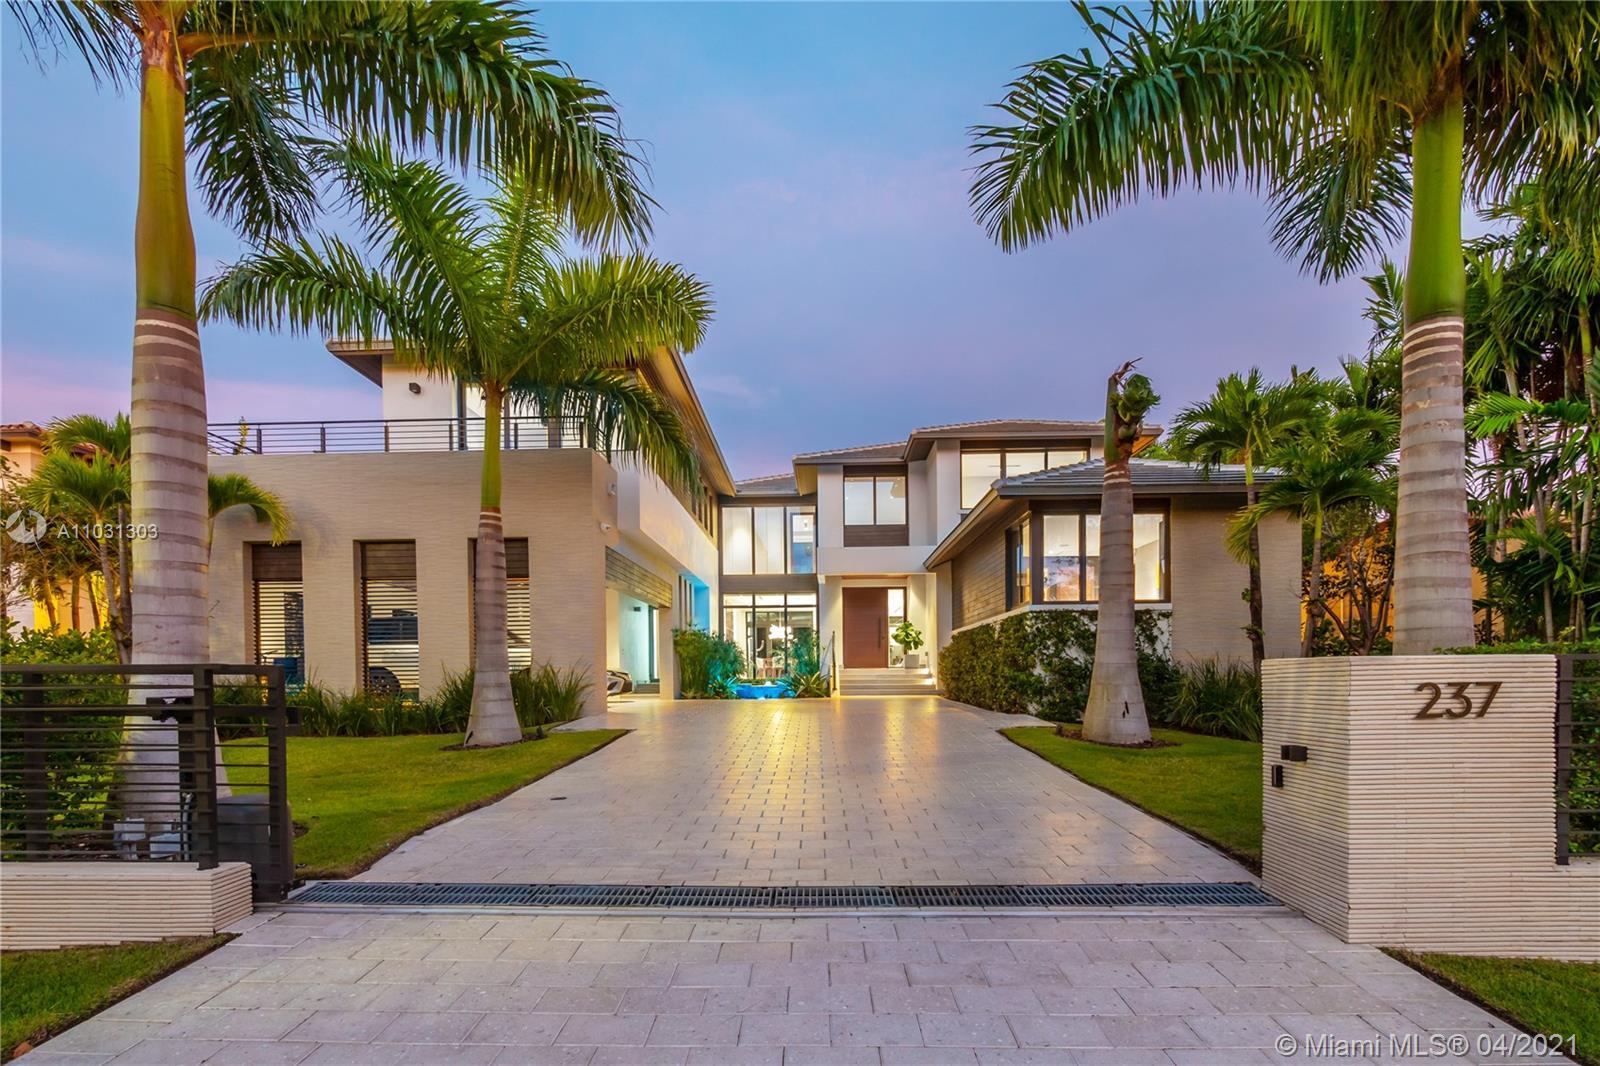 237 Bal Cross Dr Luxury Real Estate